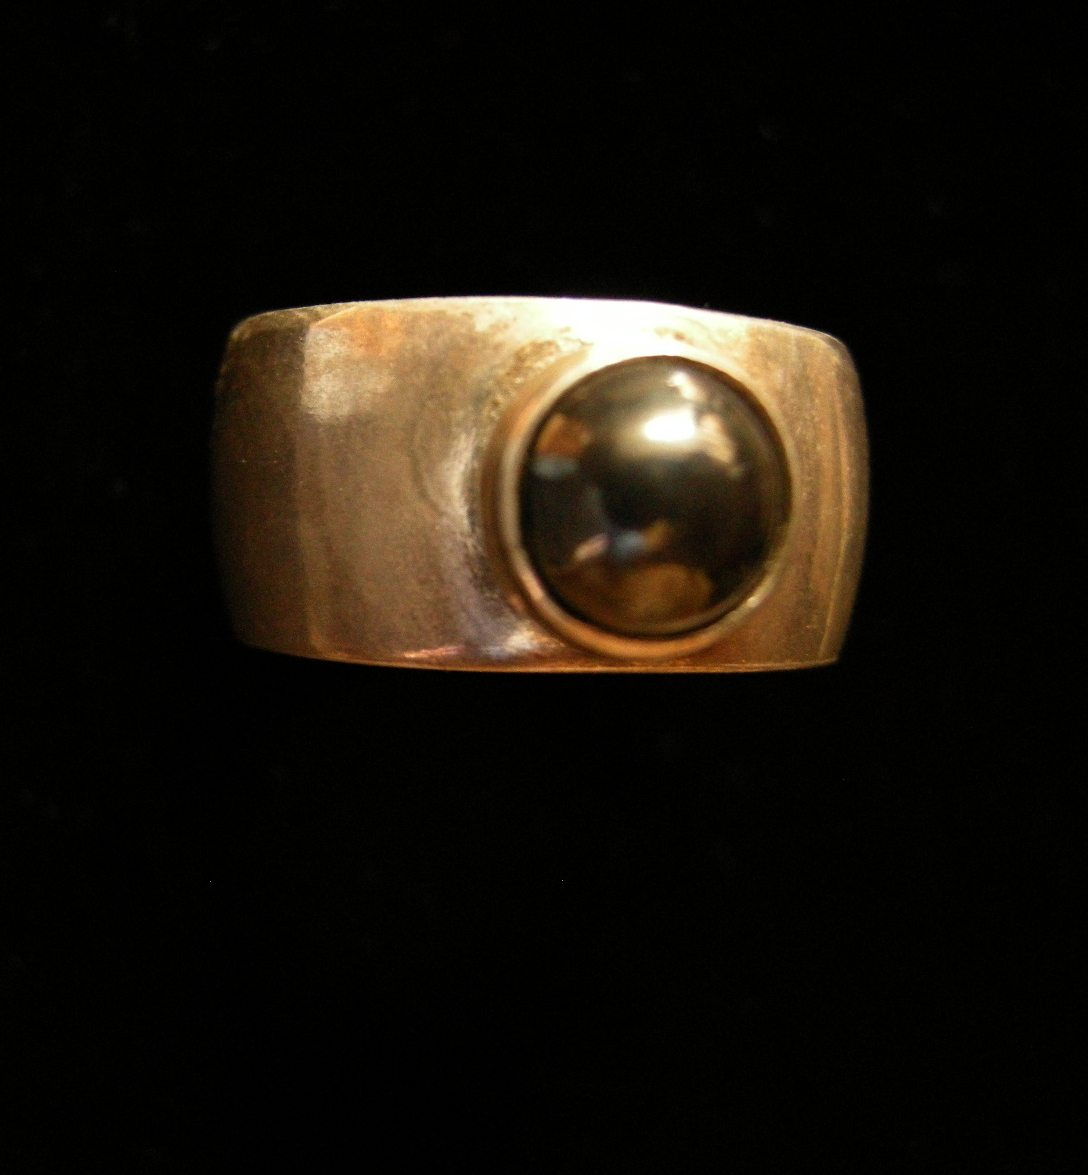 Hematite Solitaire Ring